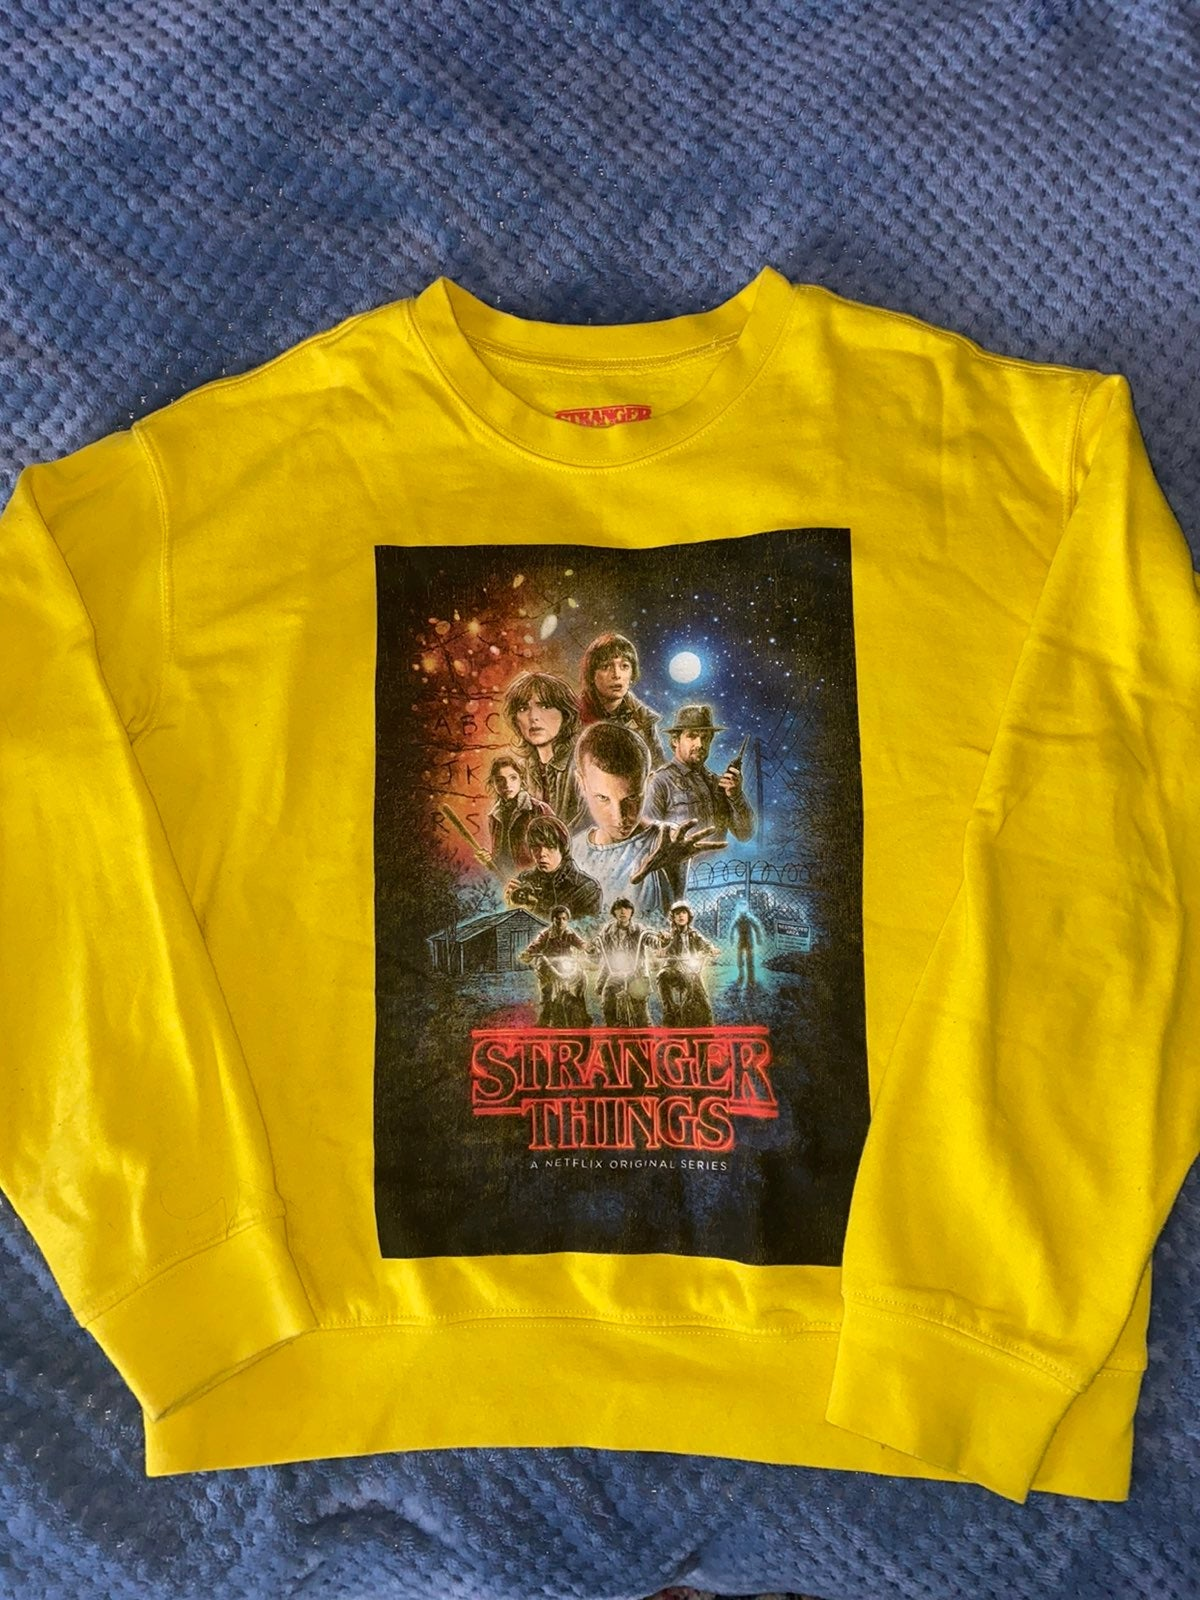 Stranger Things crewneck sweatshirt